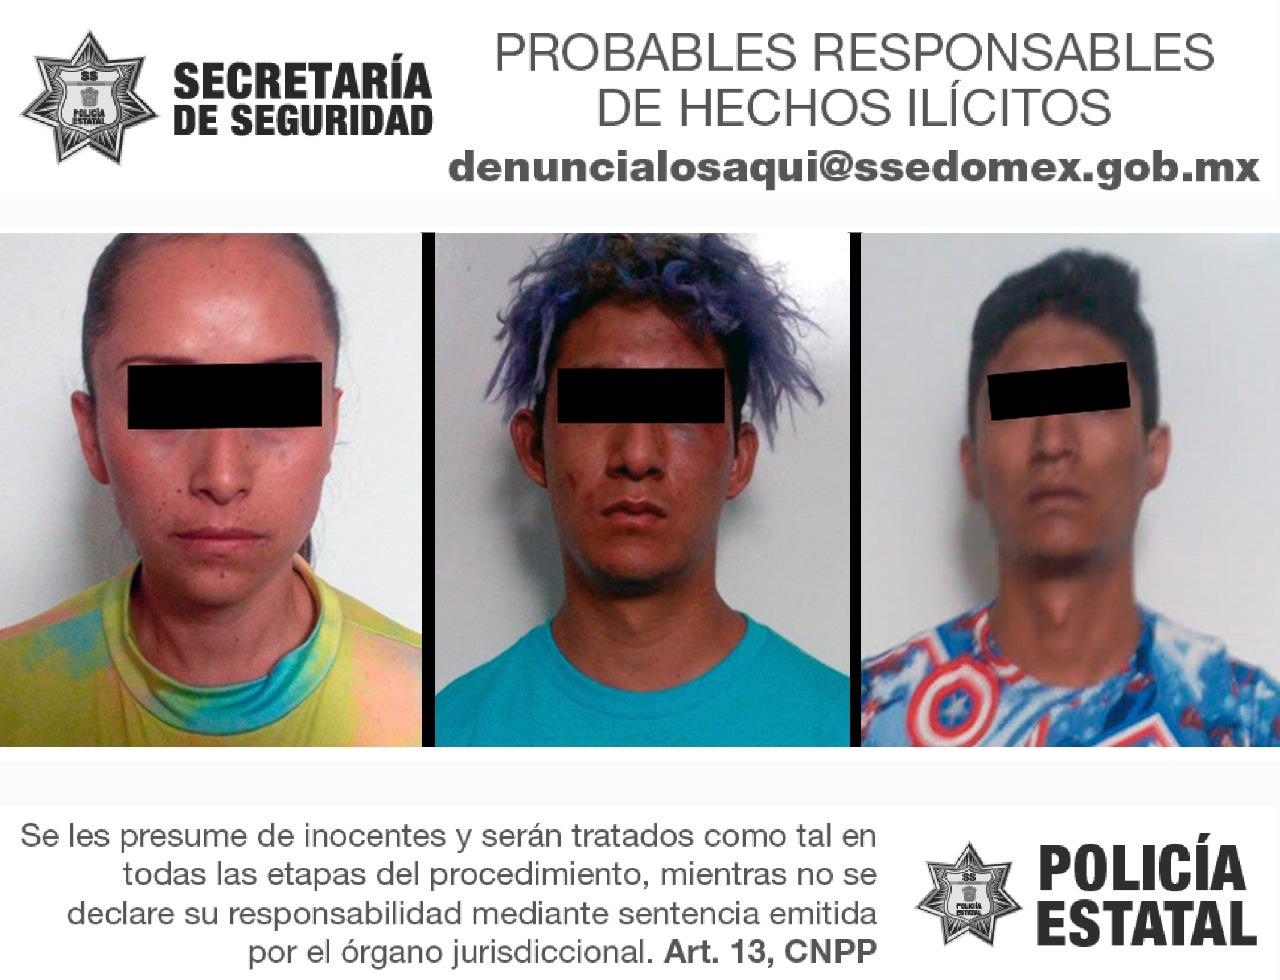 TRAS PERSECUCIÓN CAEN TRES POSIBLES RESPONSABLES DEL ROBO DE VEHÍCULO CON VIOLENCIA